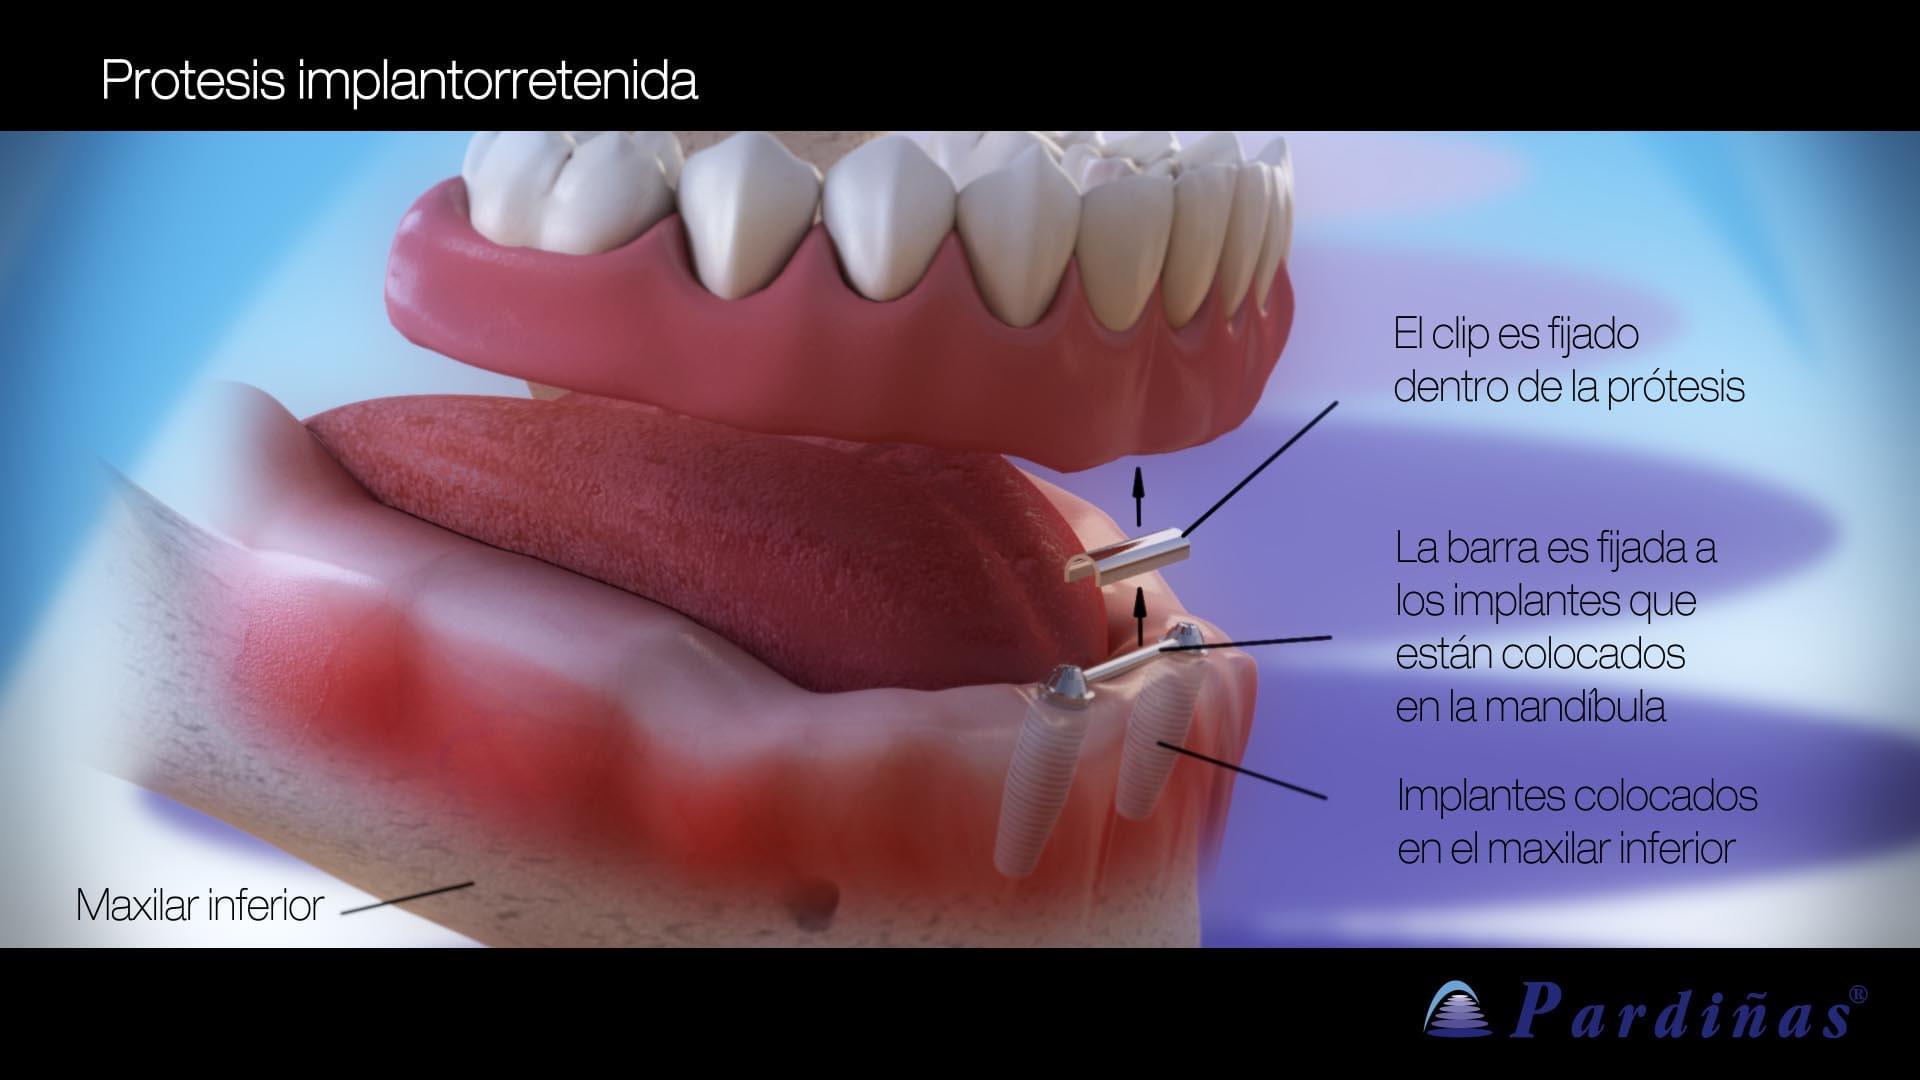 Prótesis Implantorretenida